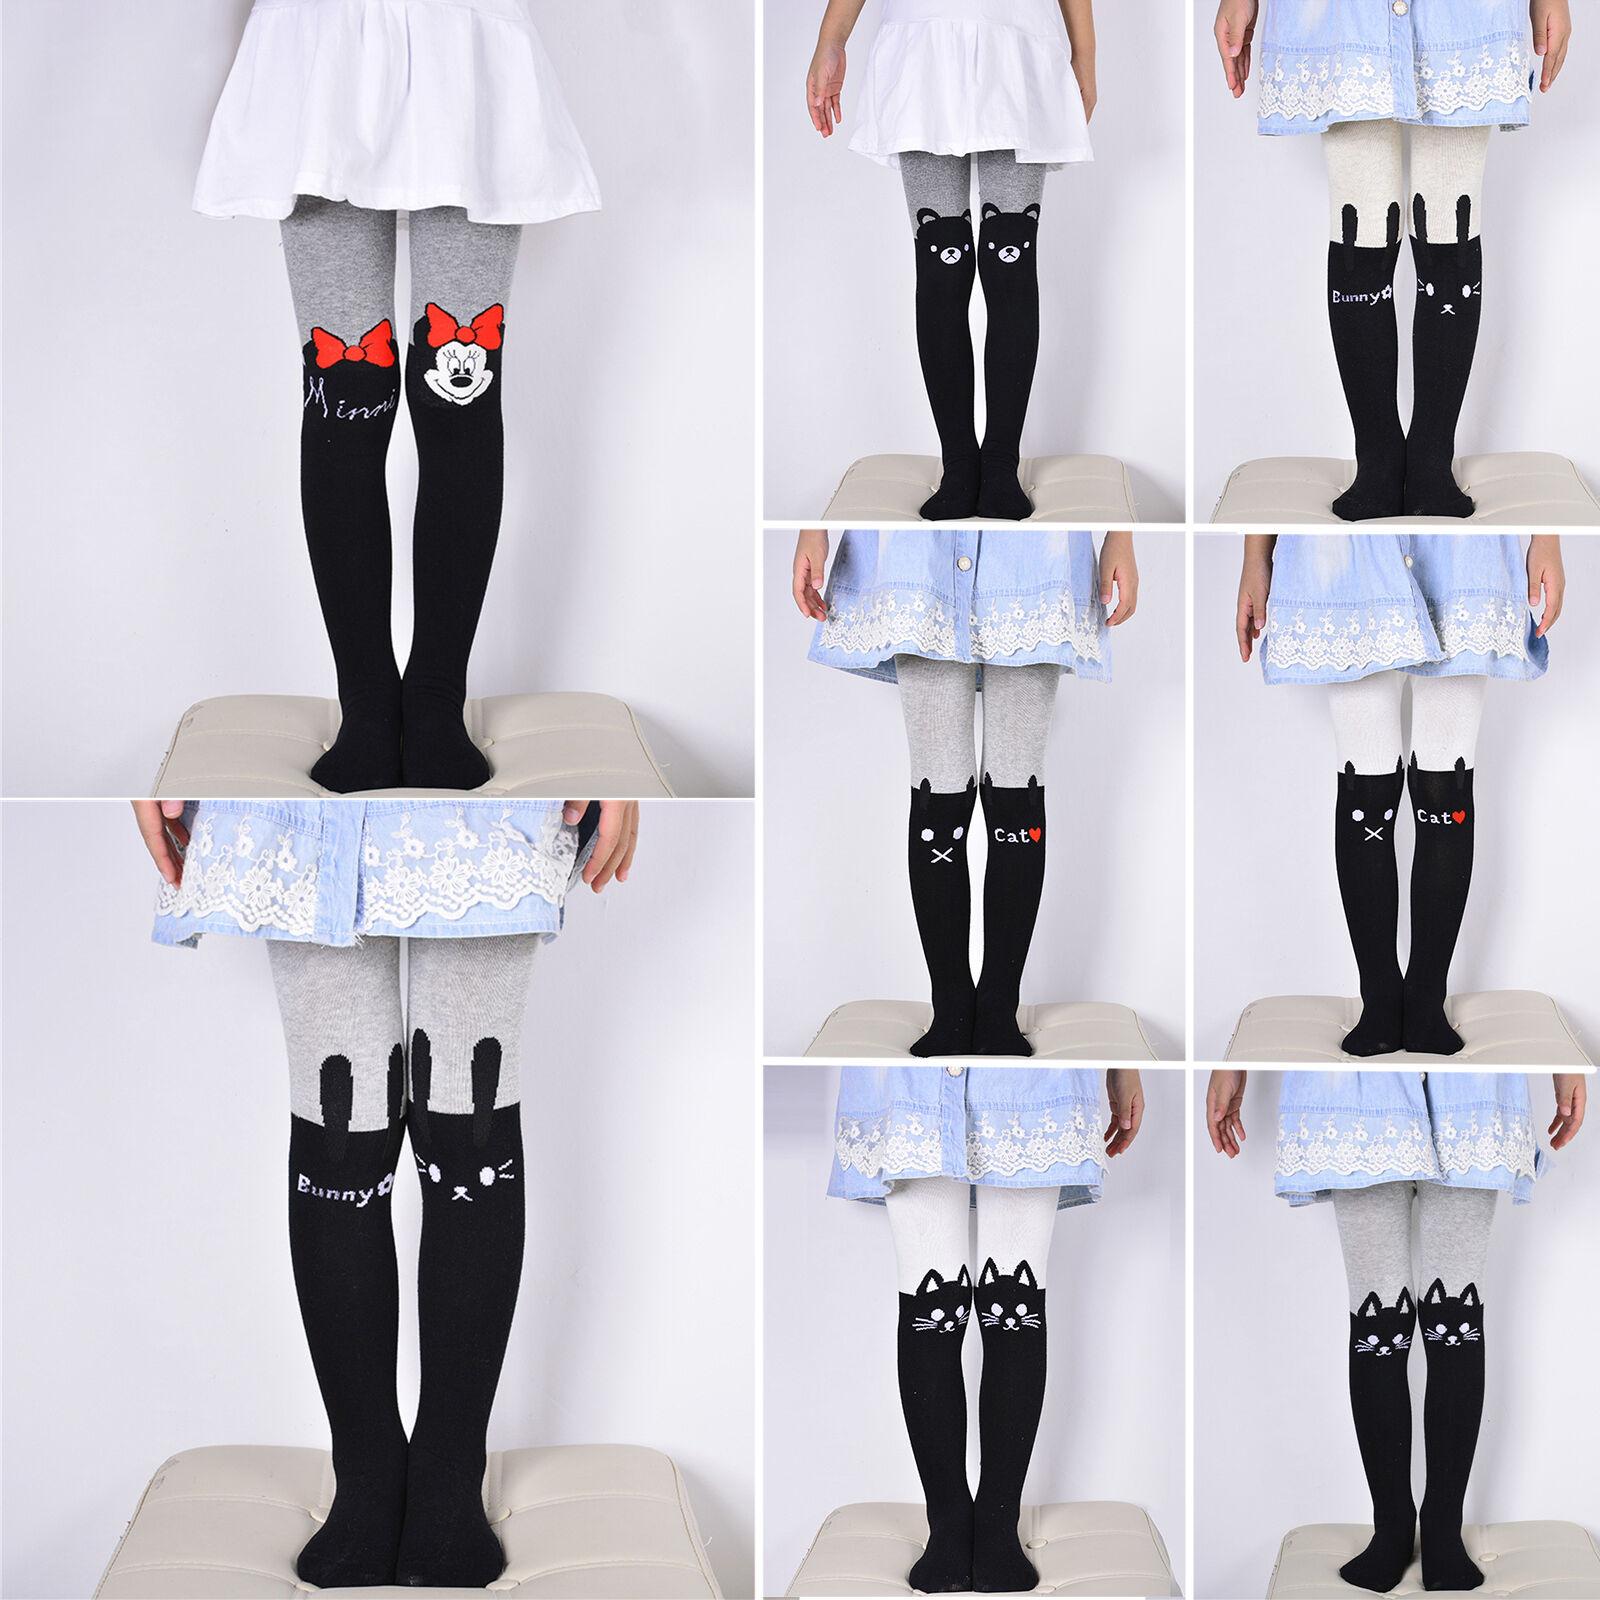 Kinder Mädchen Thermo Strumpfhose Strümpfe Leggings Winter Leggins Hosen Socken